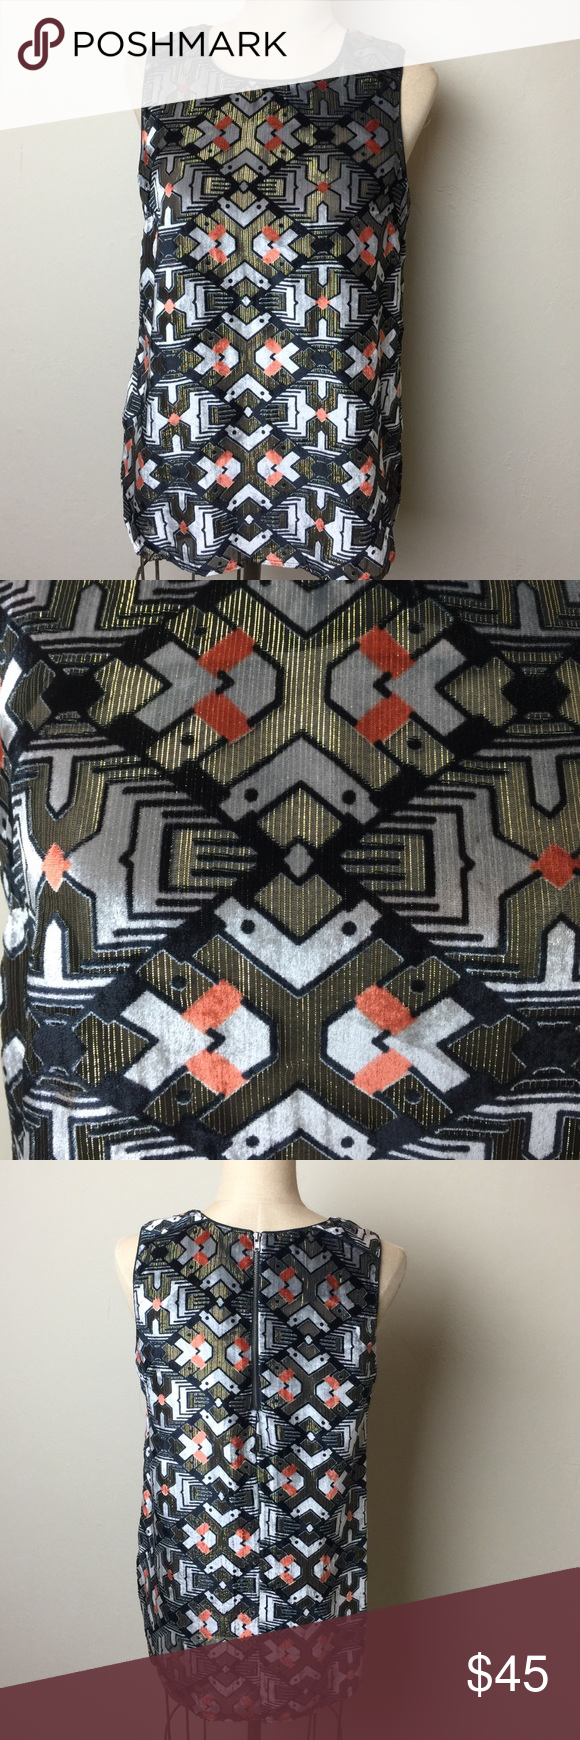 Anthro sheer metallic stripe/velvet print top Gorgeous geometric print combining black sheer material with metallic gold stripe and velvet. Rounded hem line. Rayon/nylon/metallic. Zip back. Unlined Meadow rue for Anthropologie Anthropologie Tops